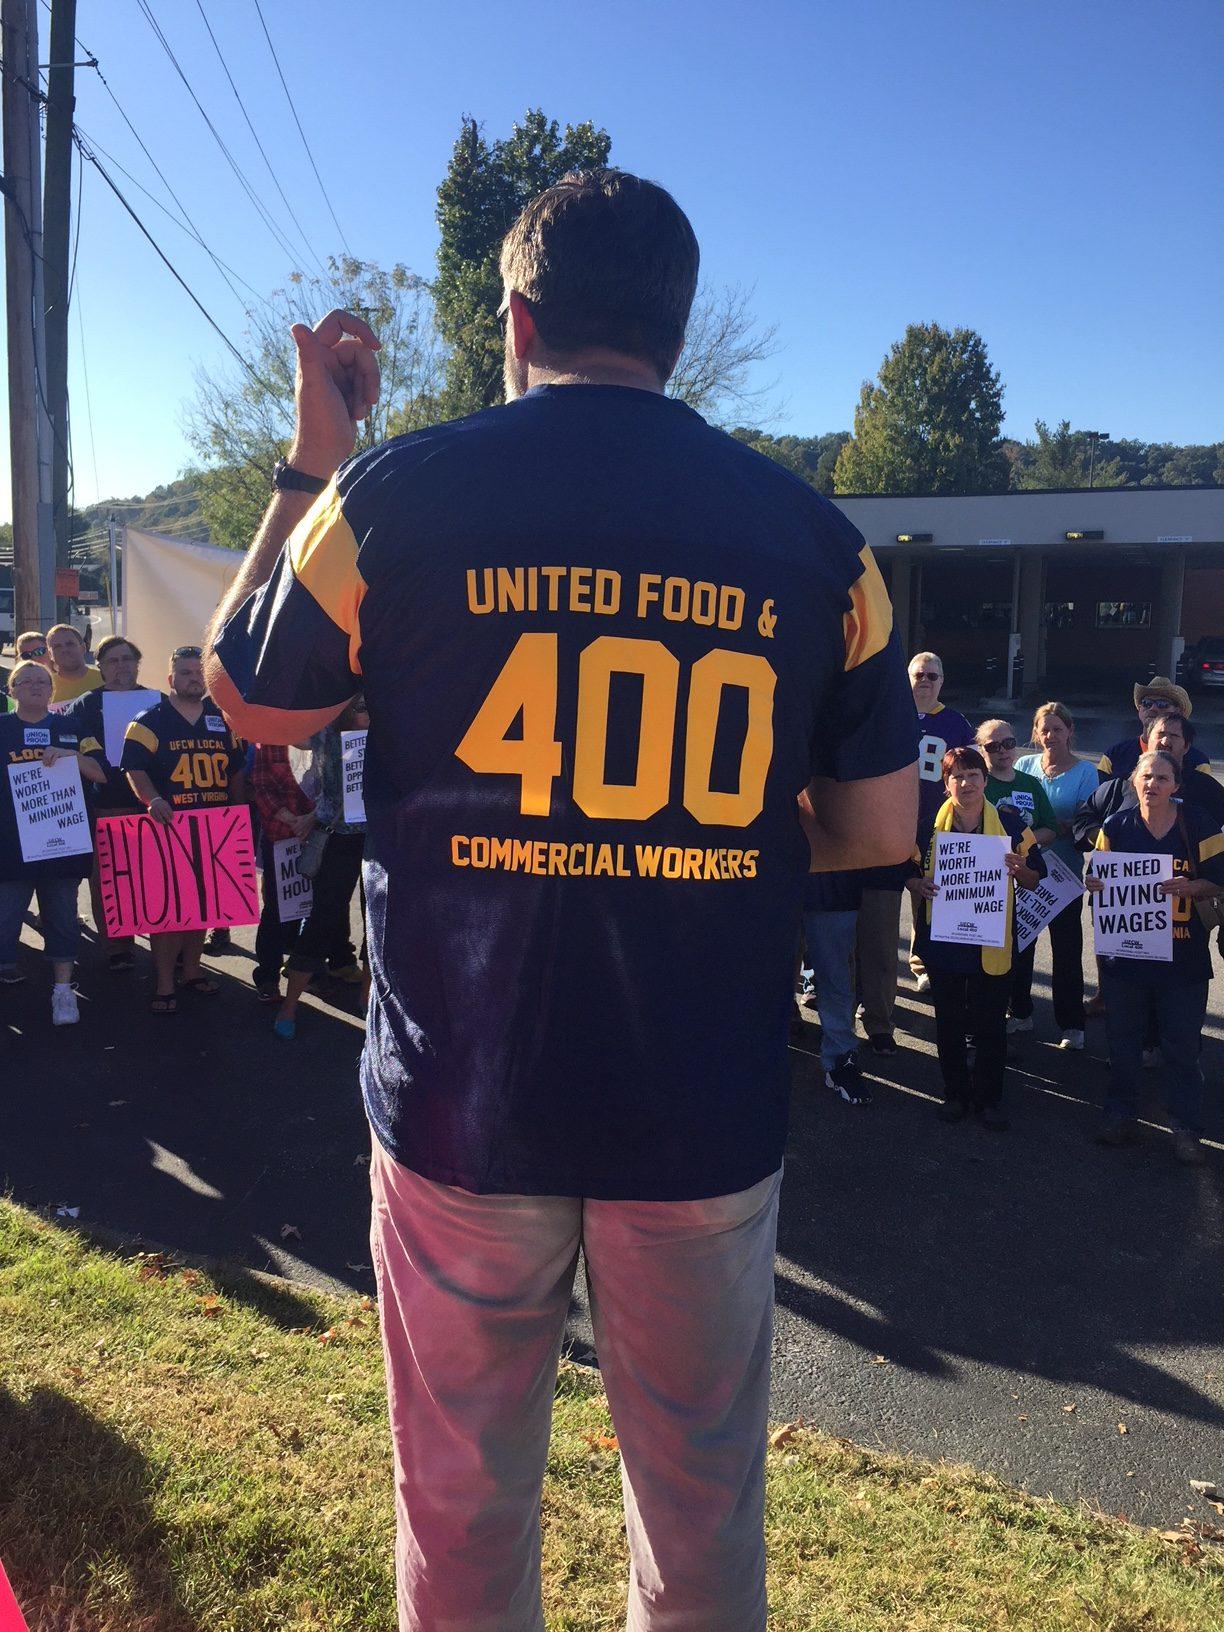 20171003-Charleston WV Kroger Action_IMG_1169 | UFCW Local 400